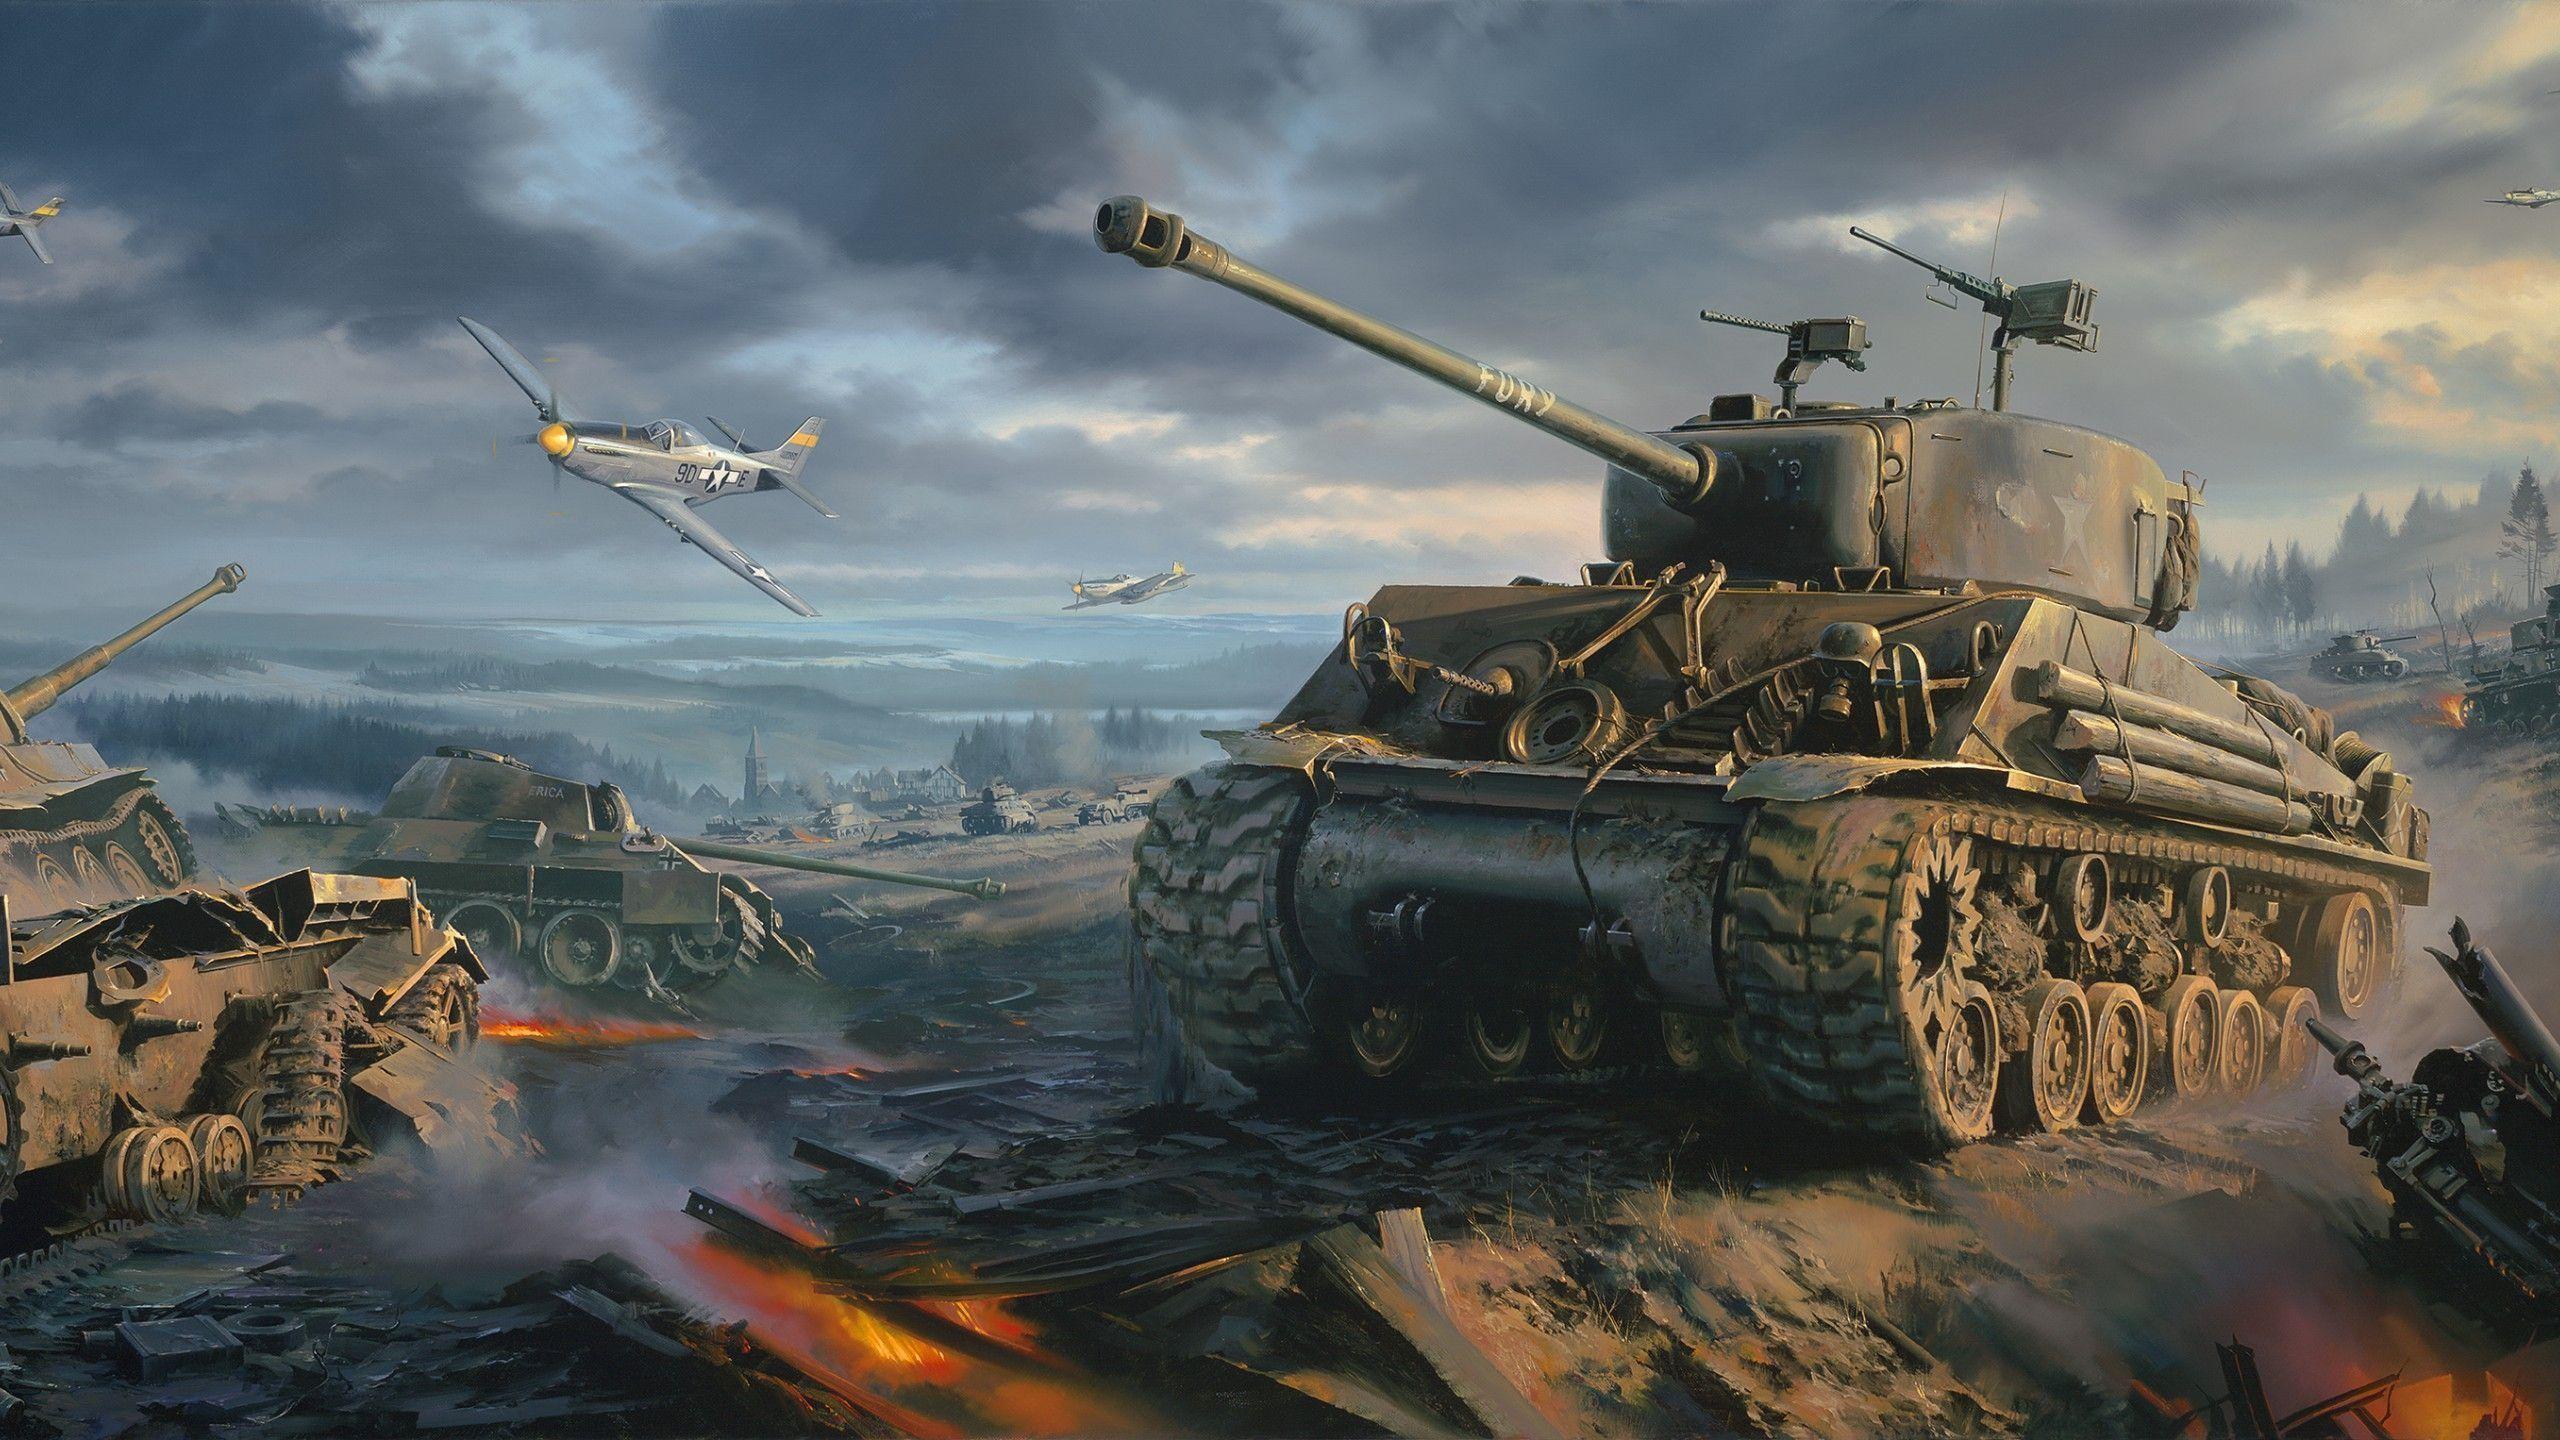 WW2 Tank Wallpaper (68+ images)